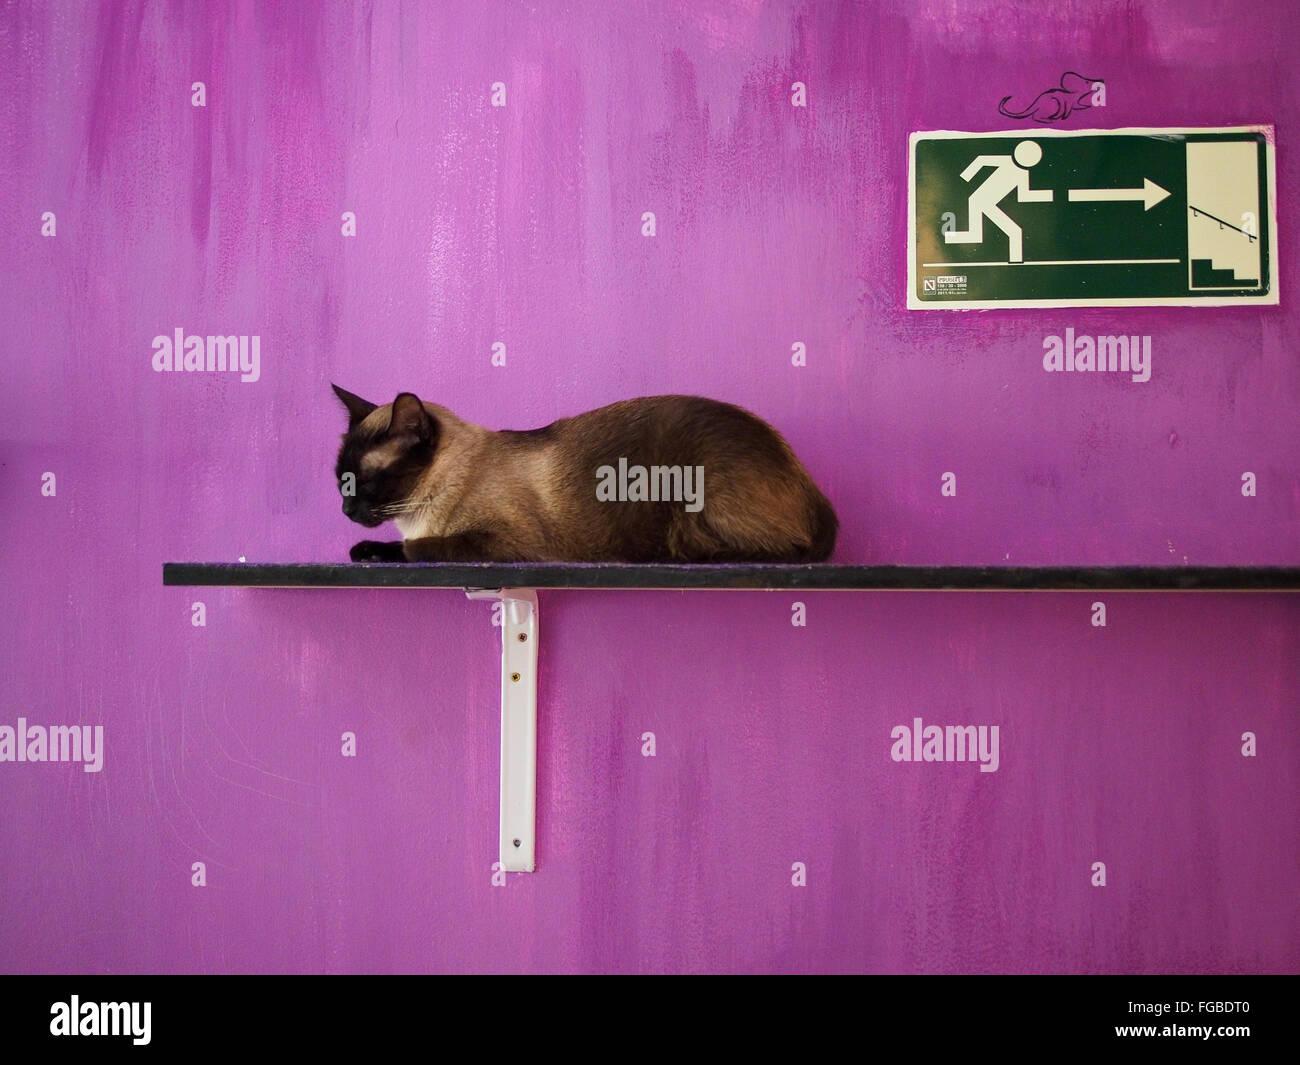 Gato descansando sobre parqué contra pared púrpura Imagen De Stock